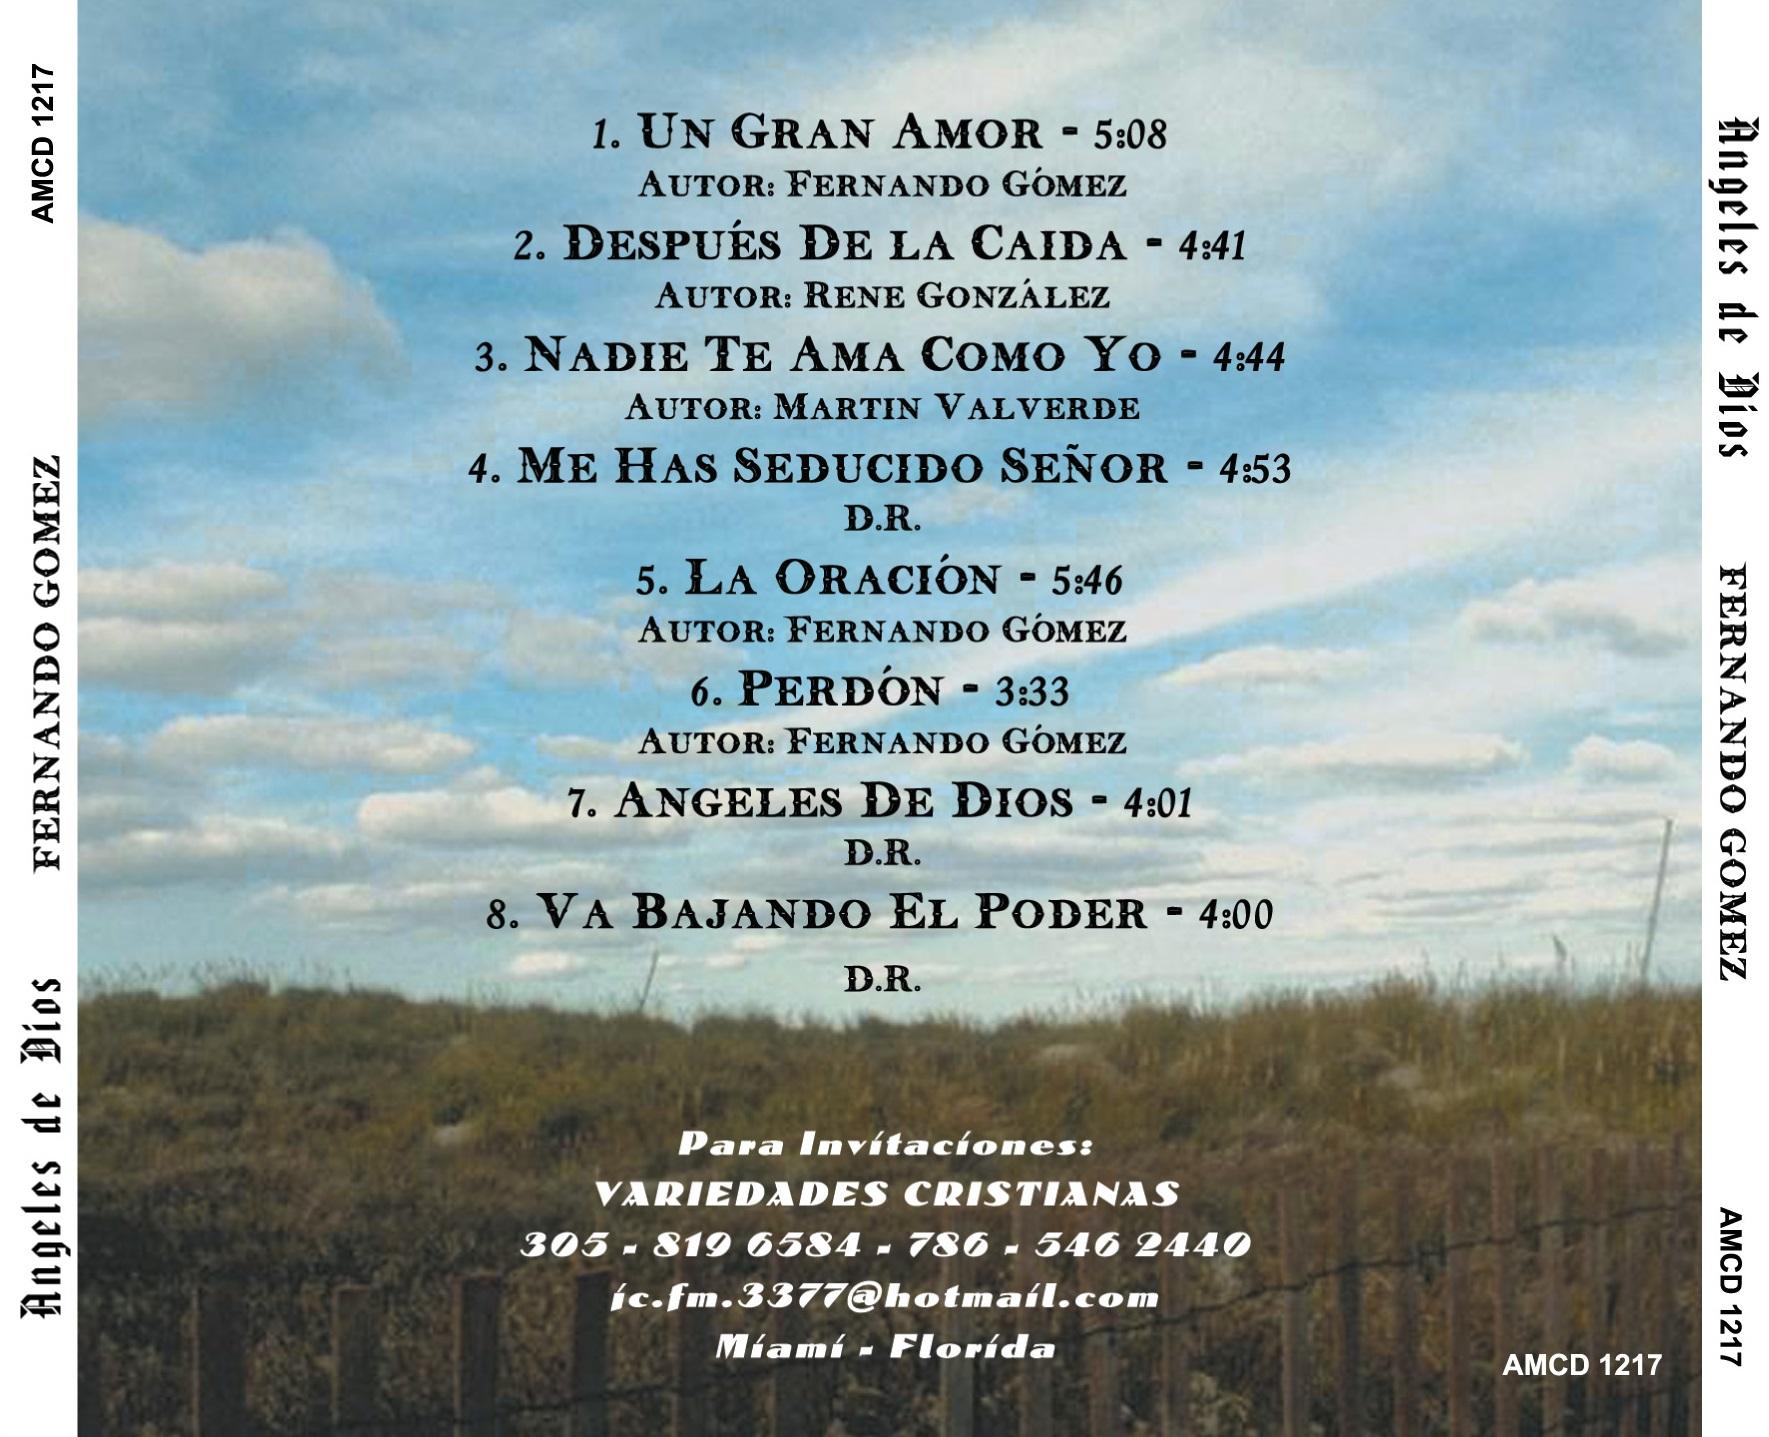 FERNANDO GOMEZ Angeles de Dios